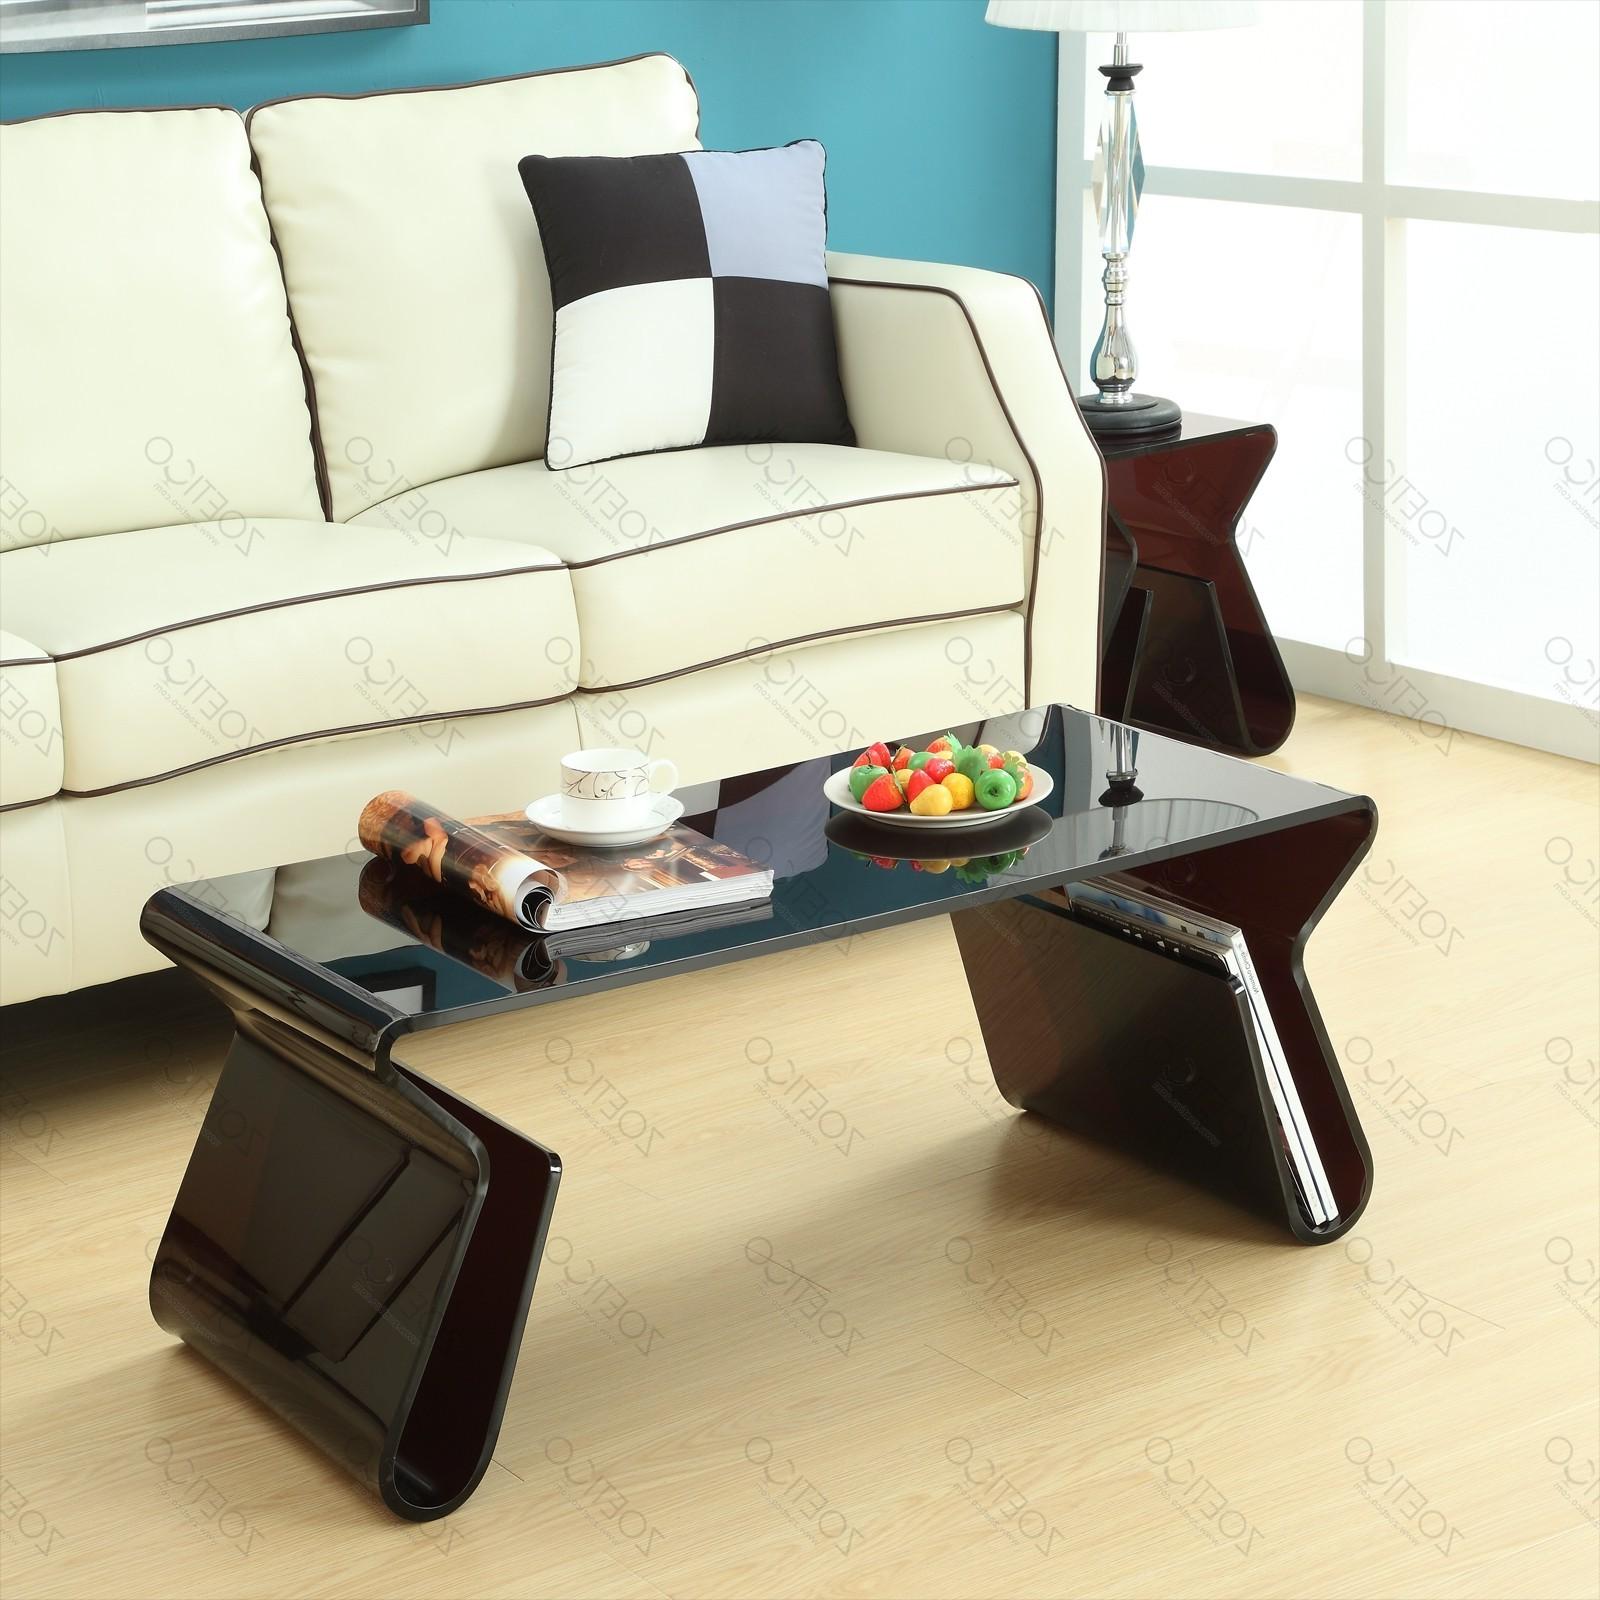 acrylic coffee table ikea 17